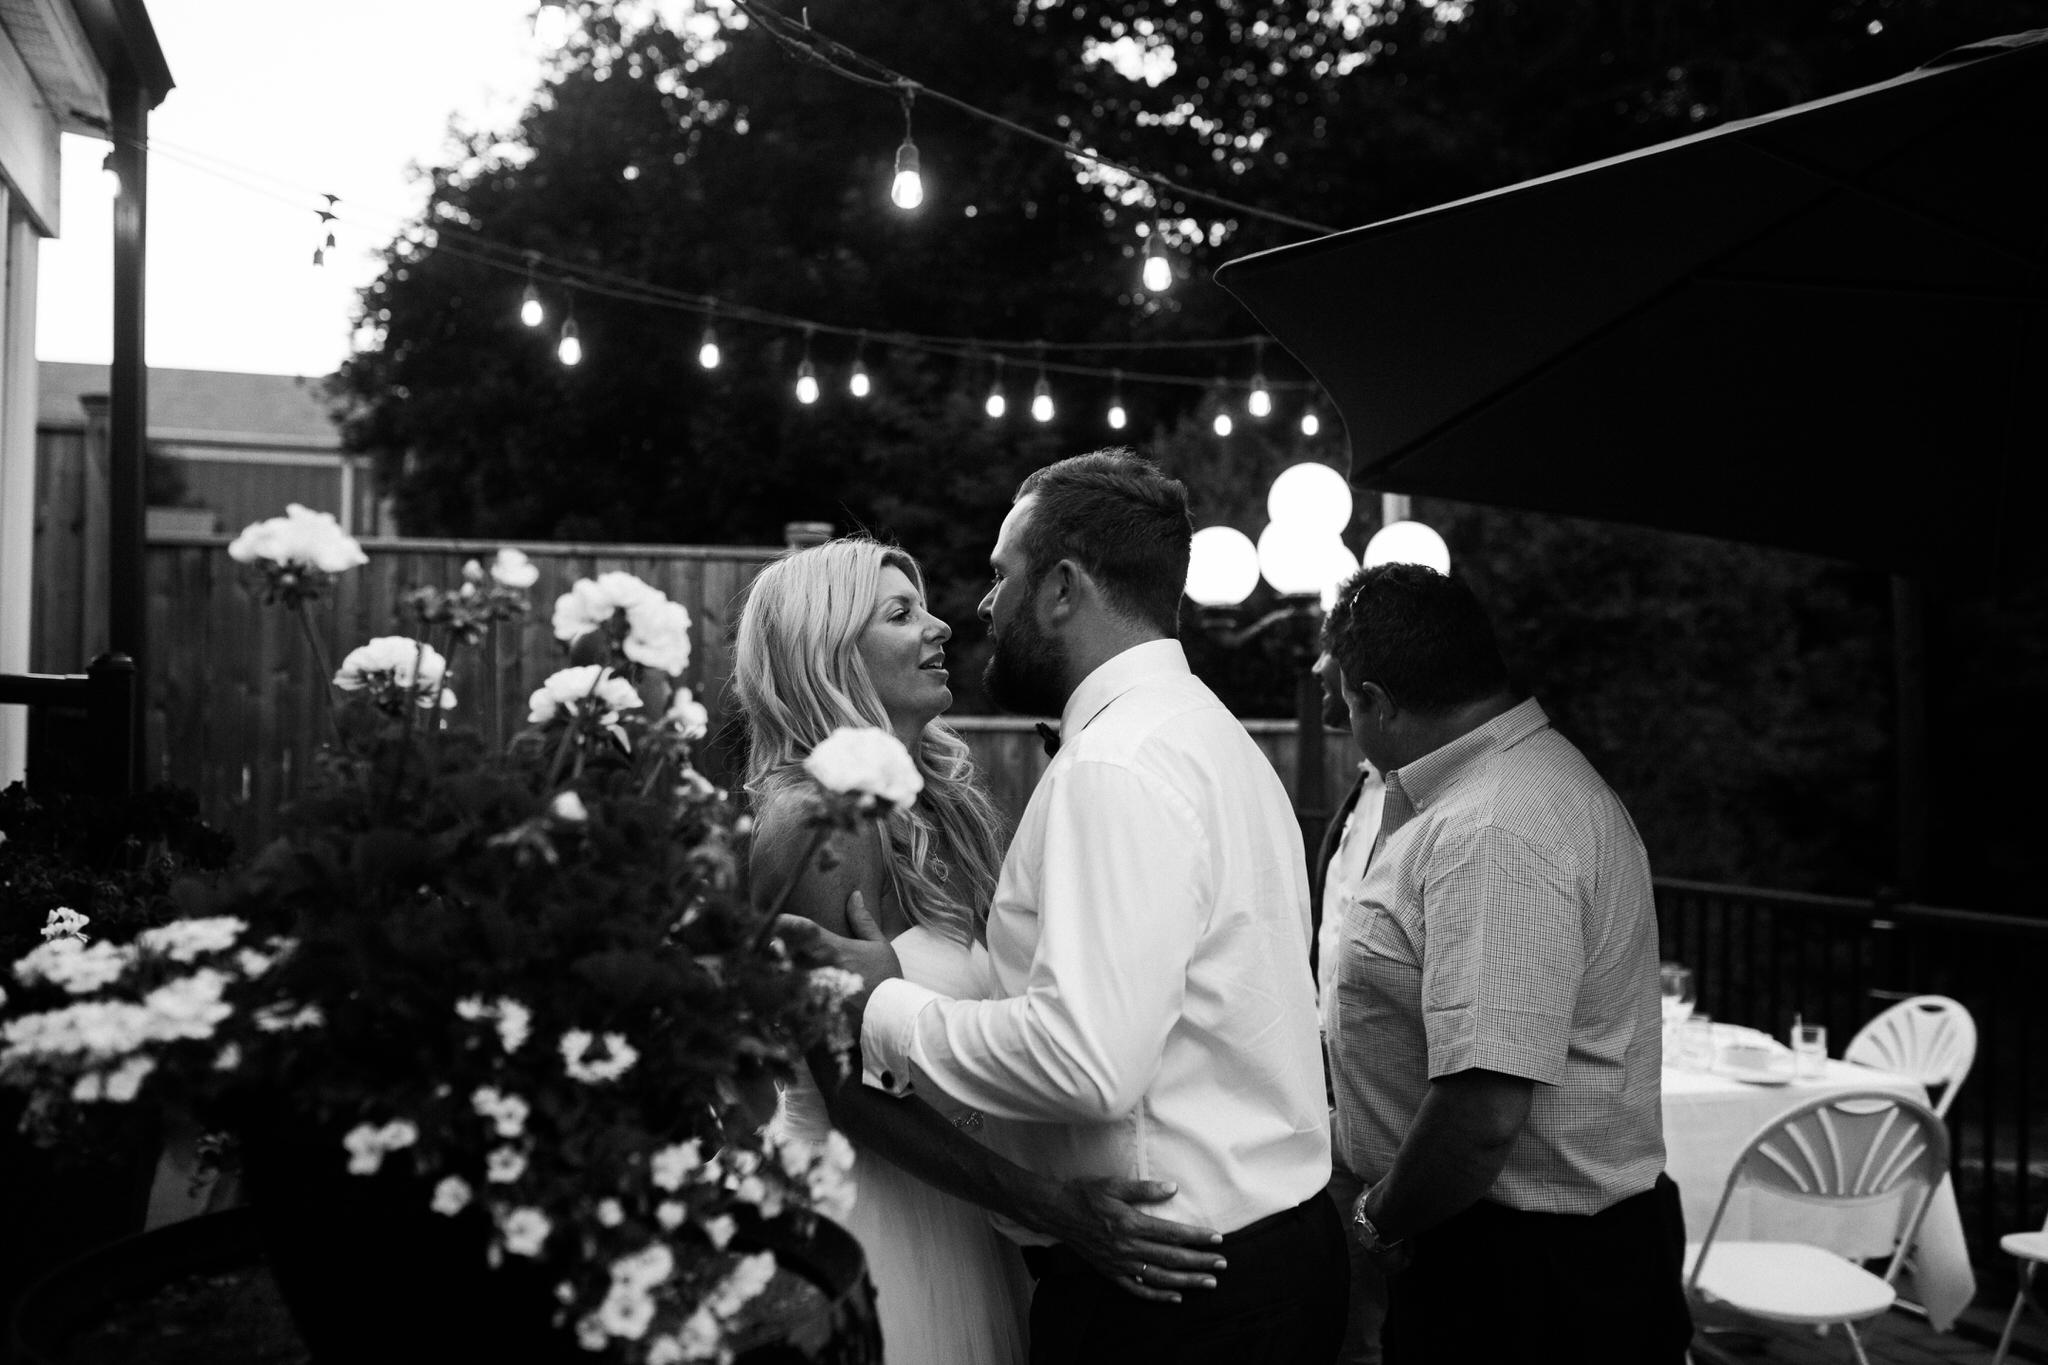 Harvest Restaurant Wedding Brooklin Ontario - Bride and groom dancing on the patio